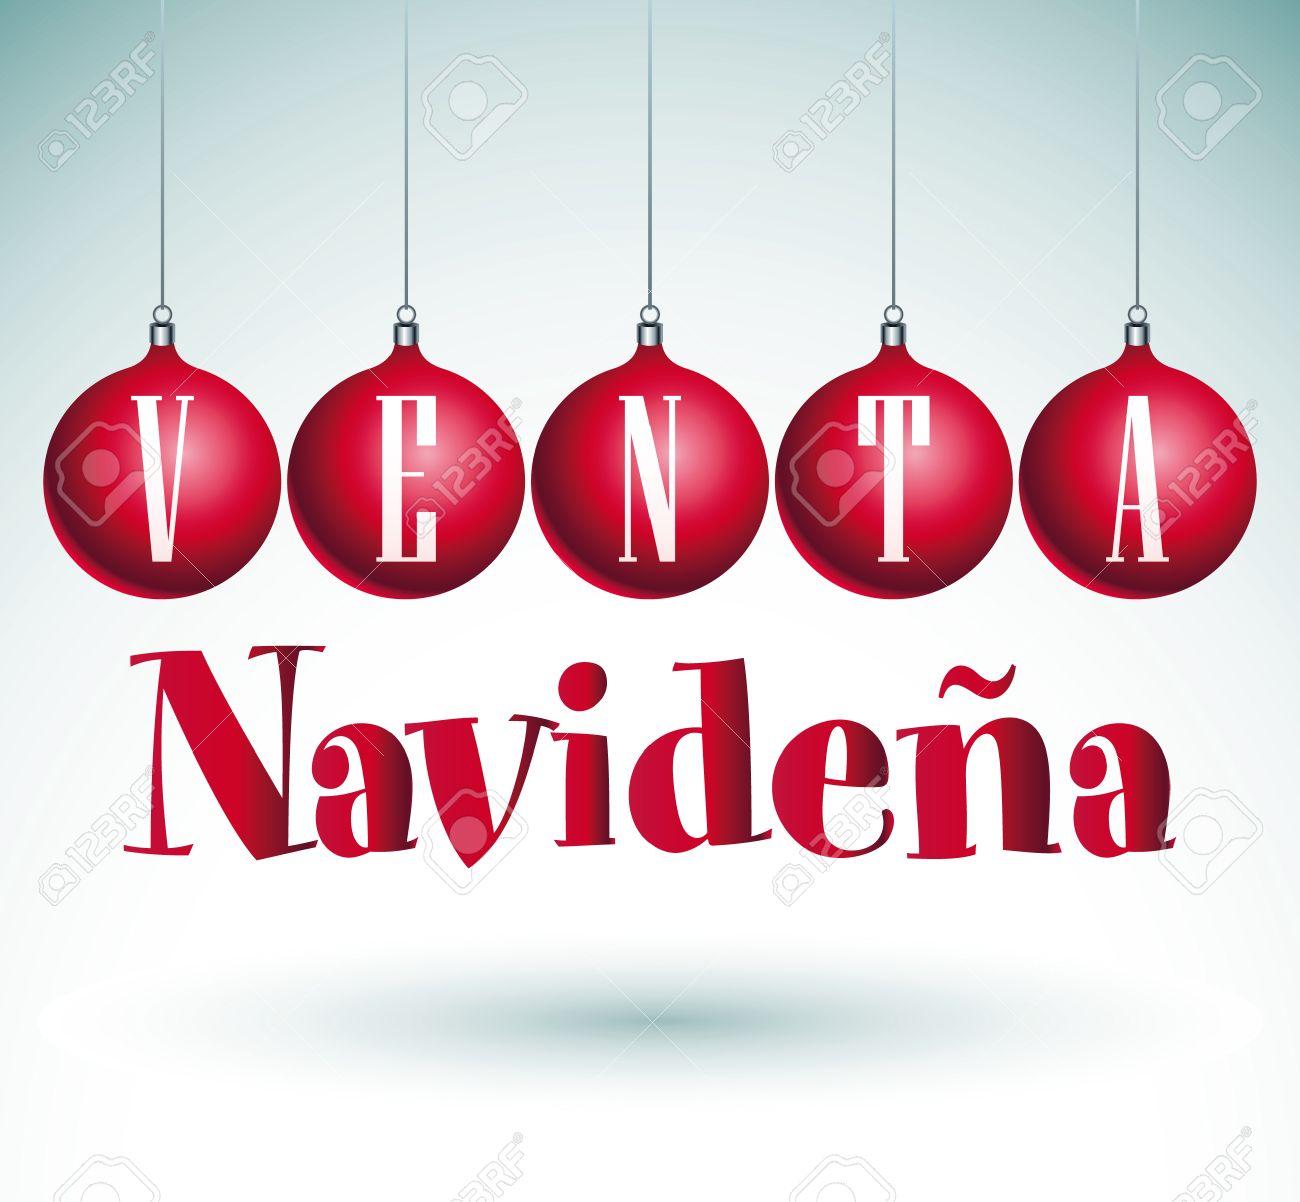 Venta Navideña Christmas Sale Spaanse Tekst Vector Royalty Vrije